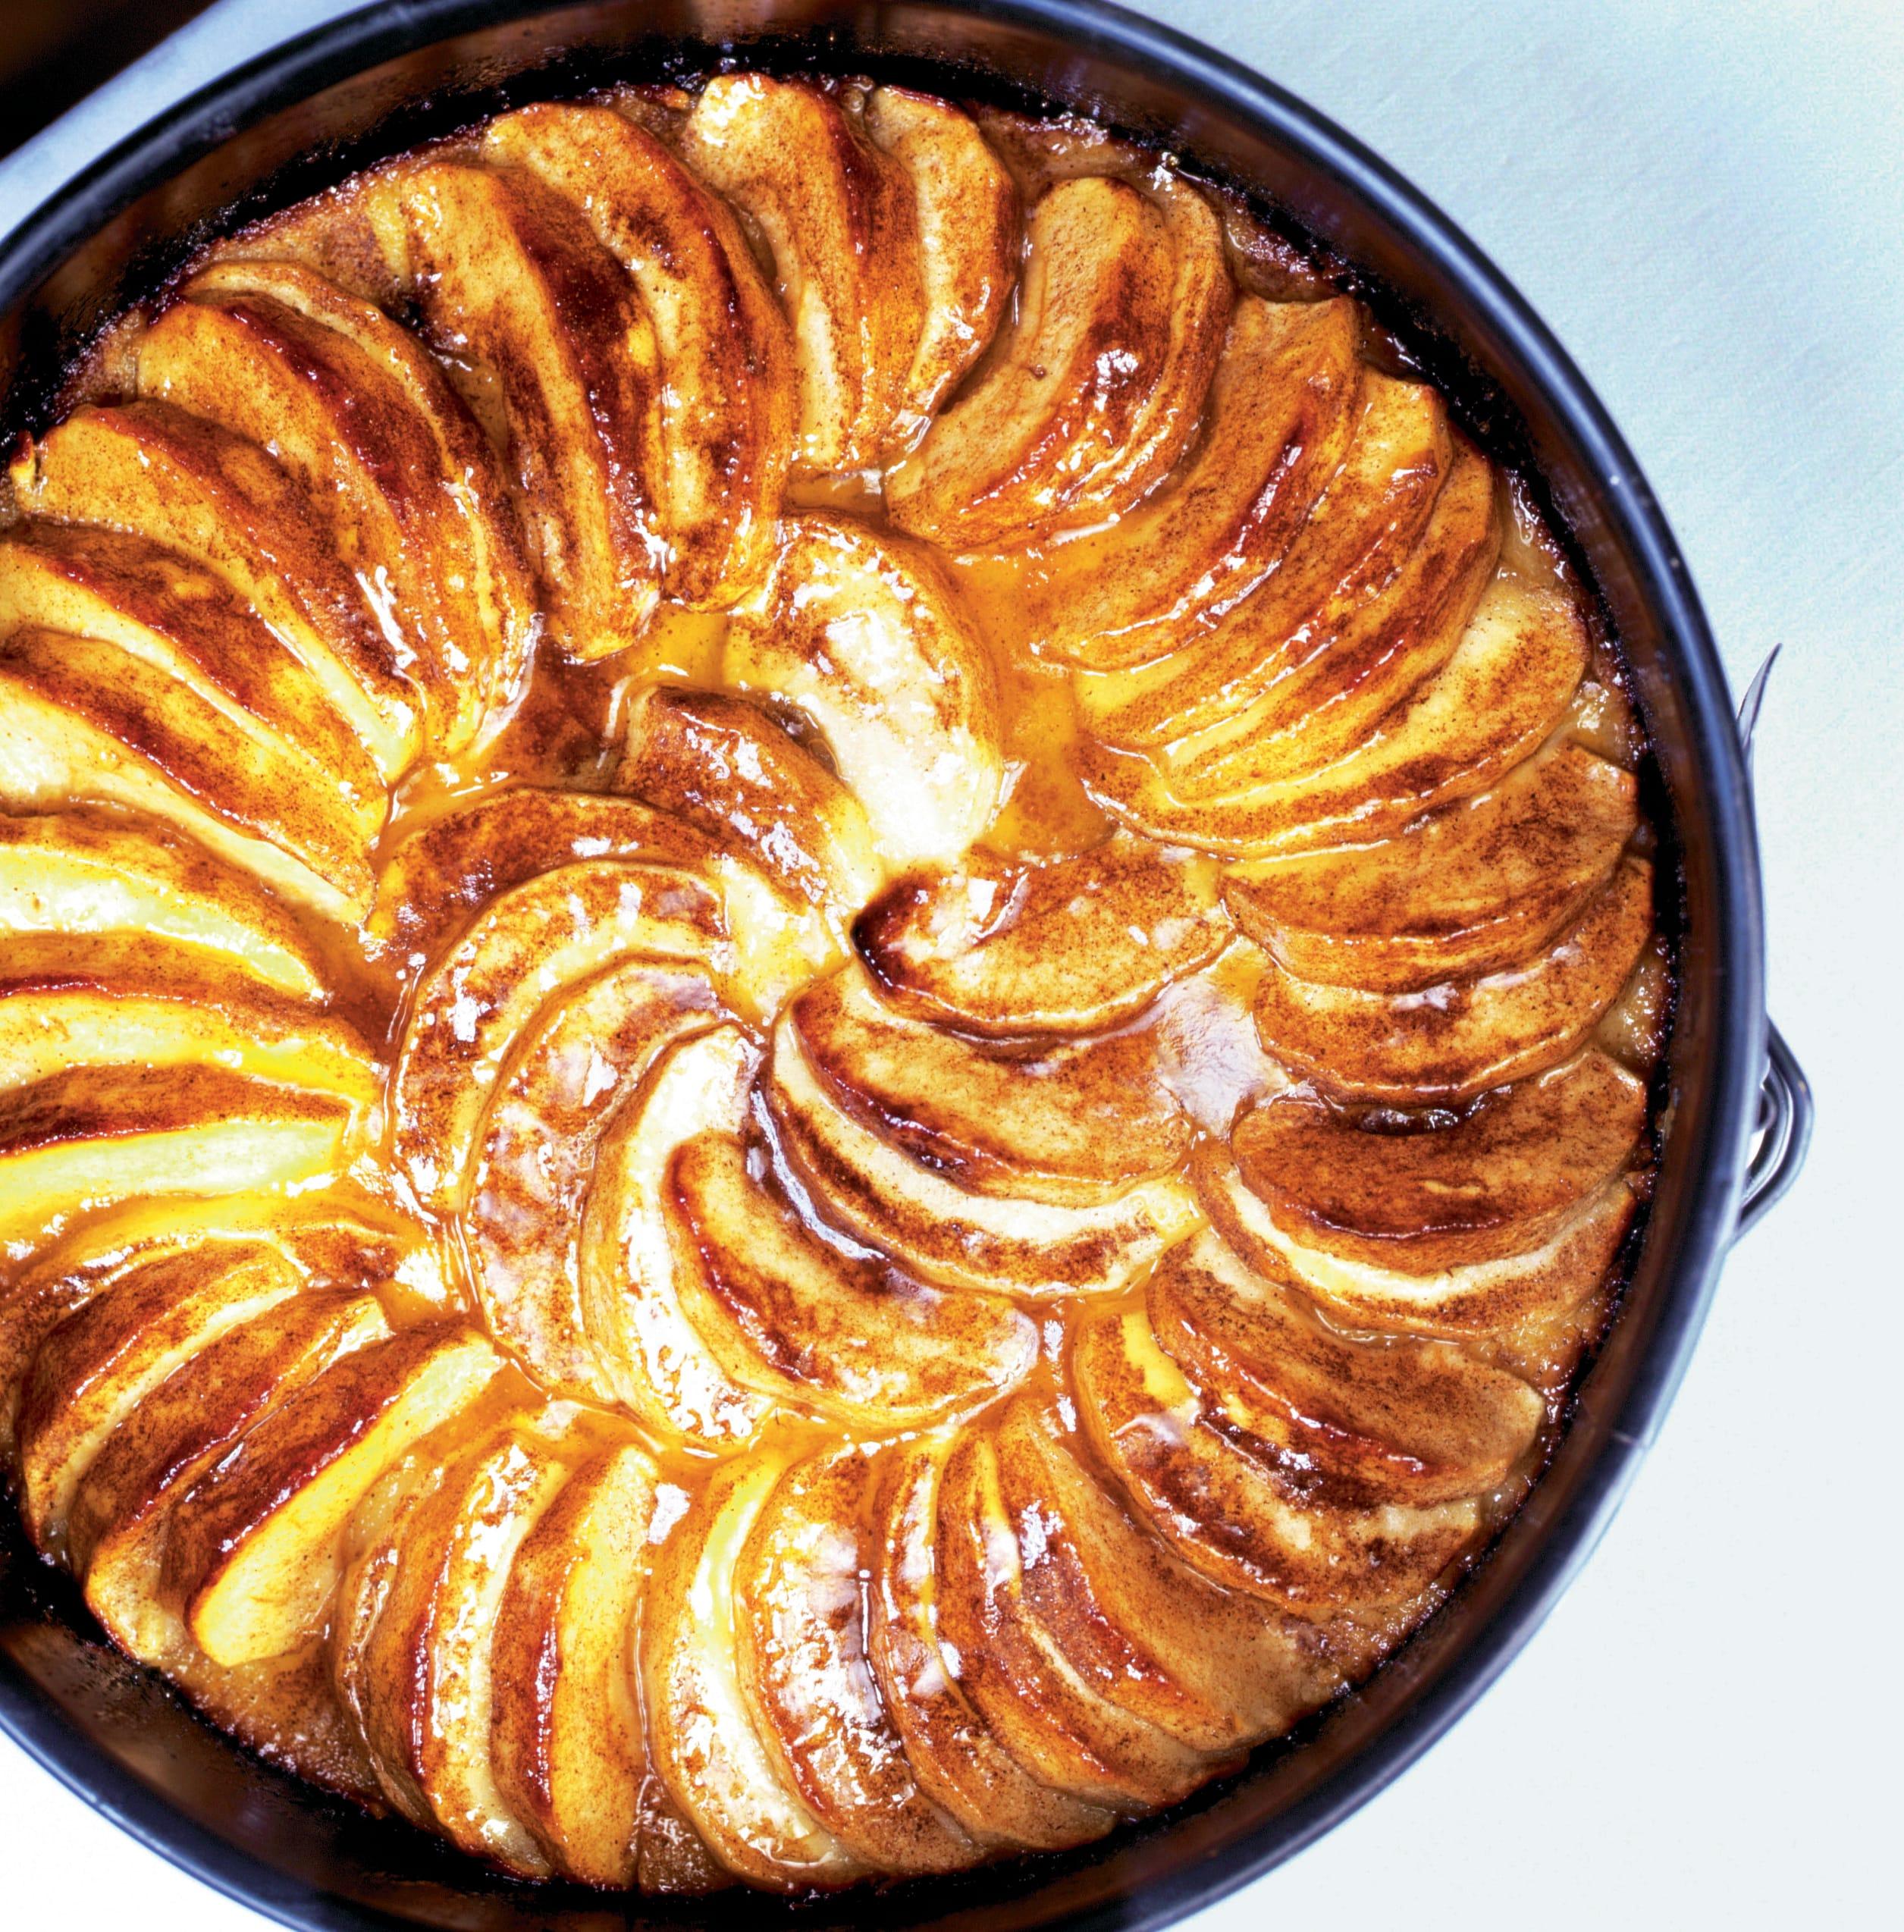 Maiskuchen mit Äpfeln und Rosinen (Tarte de maïs aux pommes et raisins)